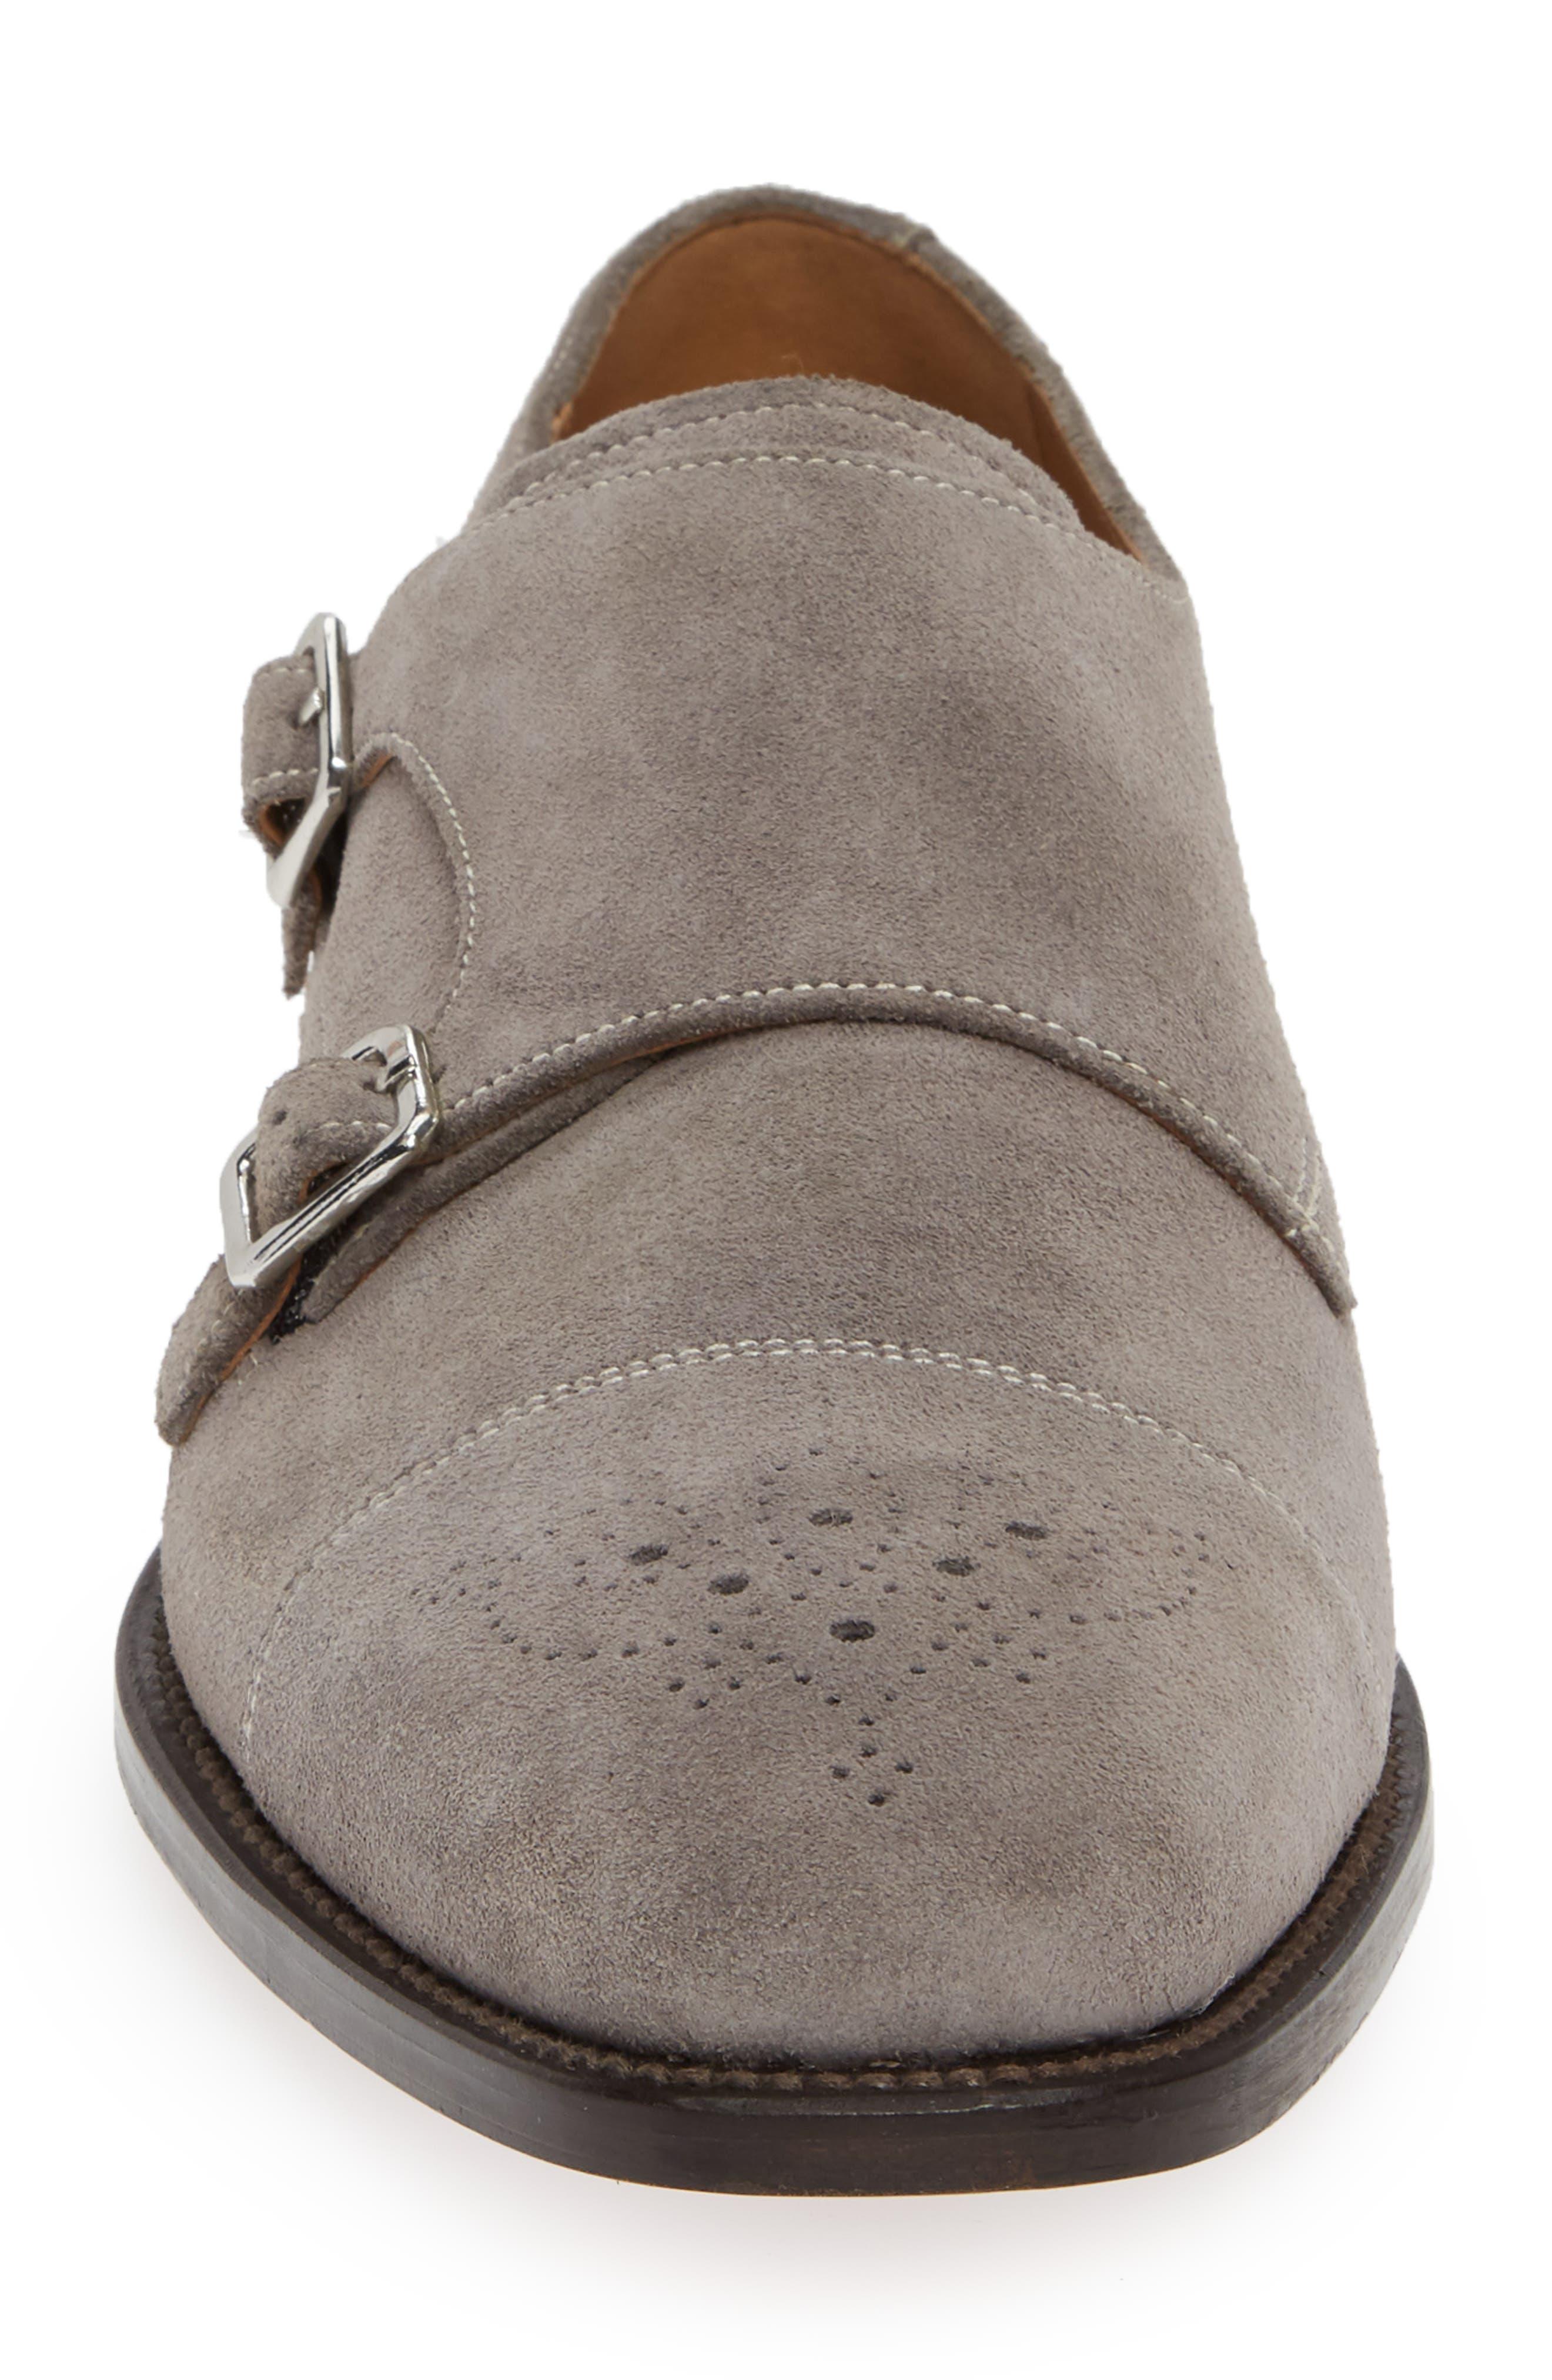 Sausalito Double Monk Strap Shoe,                             Alternate thumbnail 4, color,                             GREY SUEDE